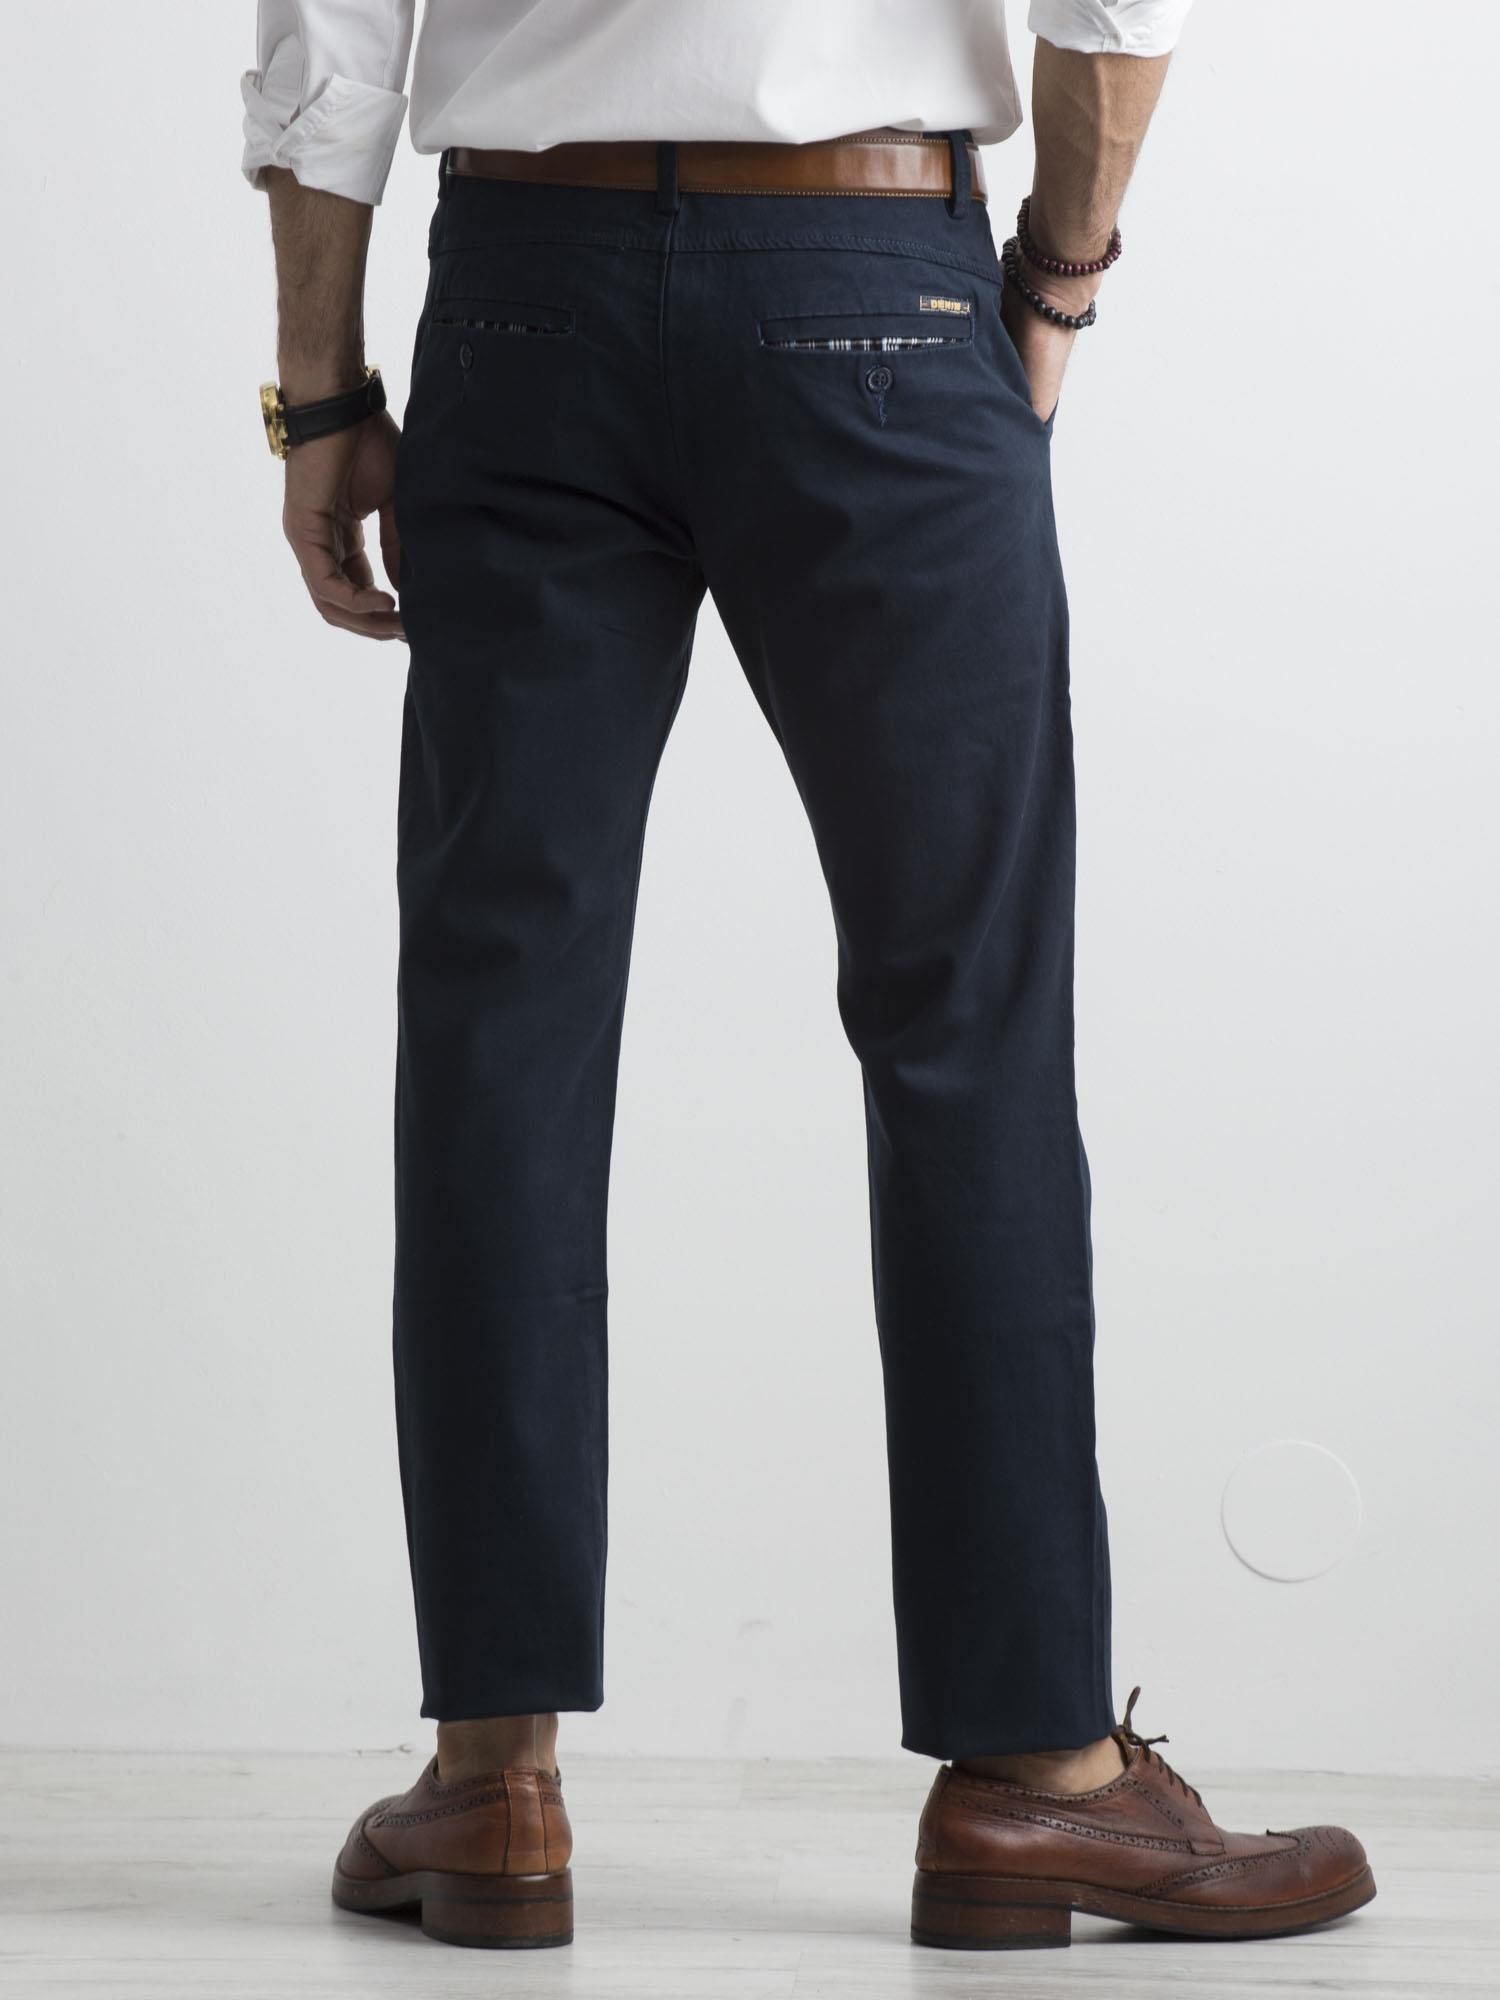 4024bb22 Męskie spodnie chino granatowe